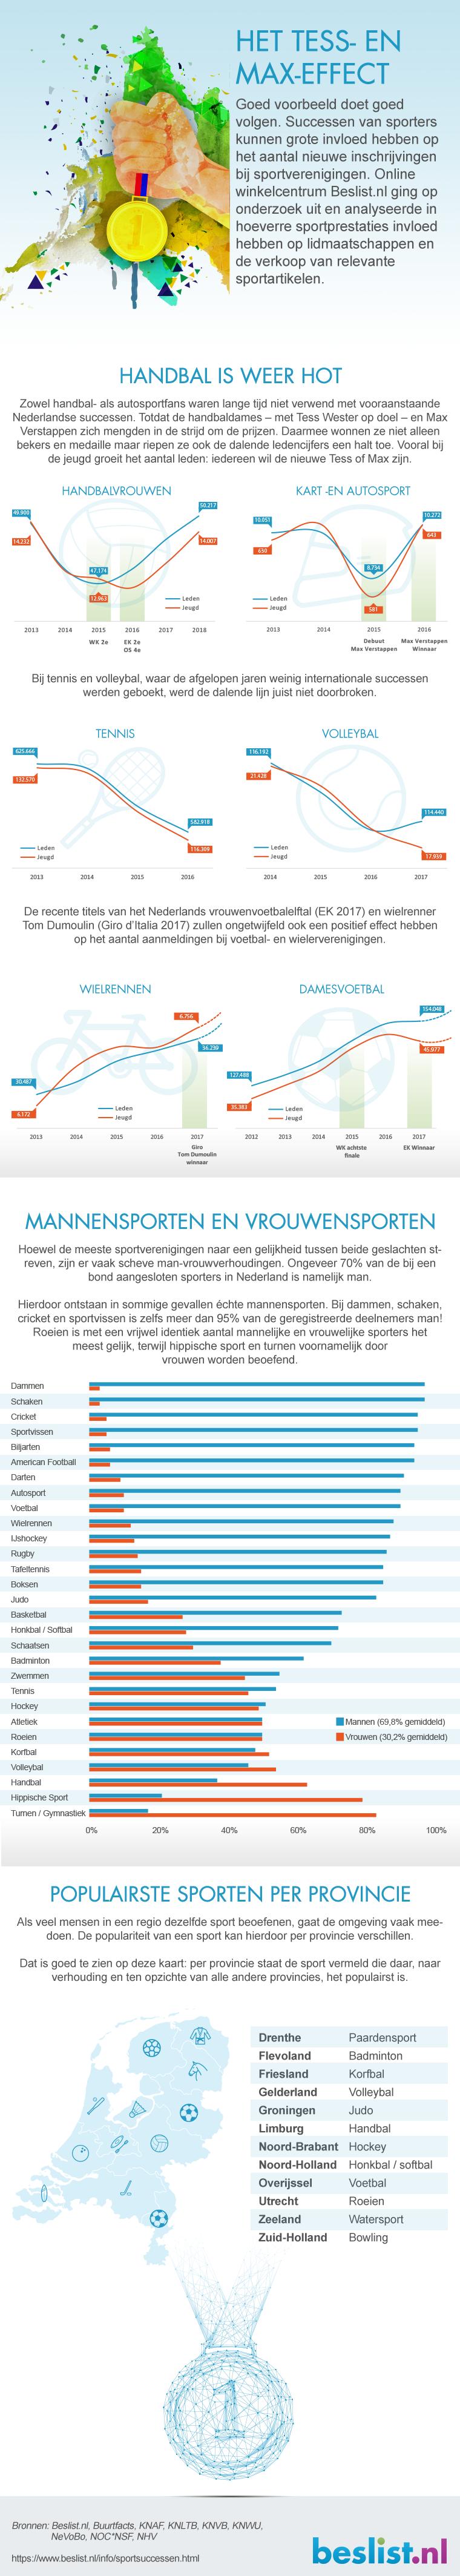 Infographic: Sportsuccessen